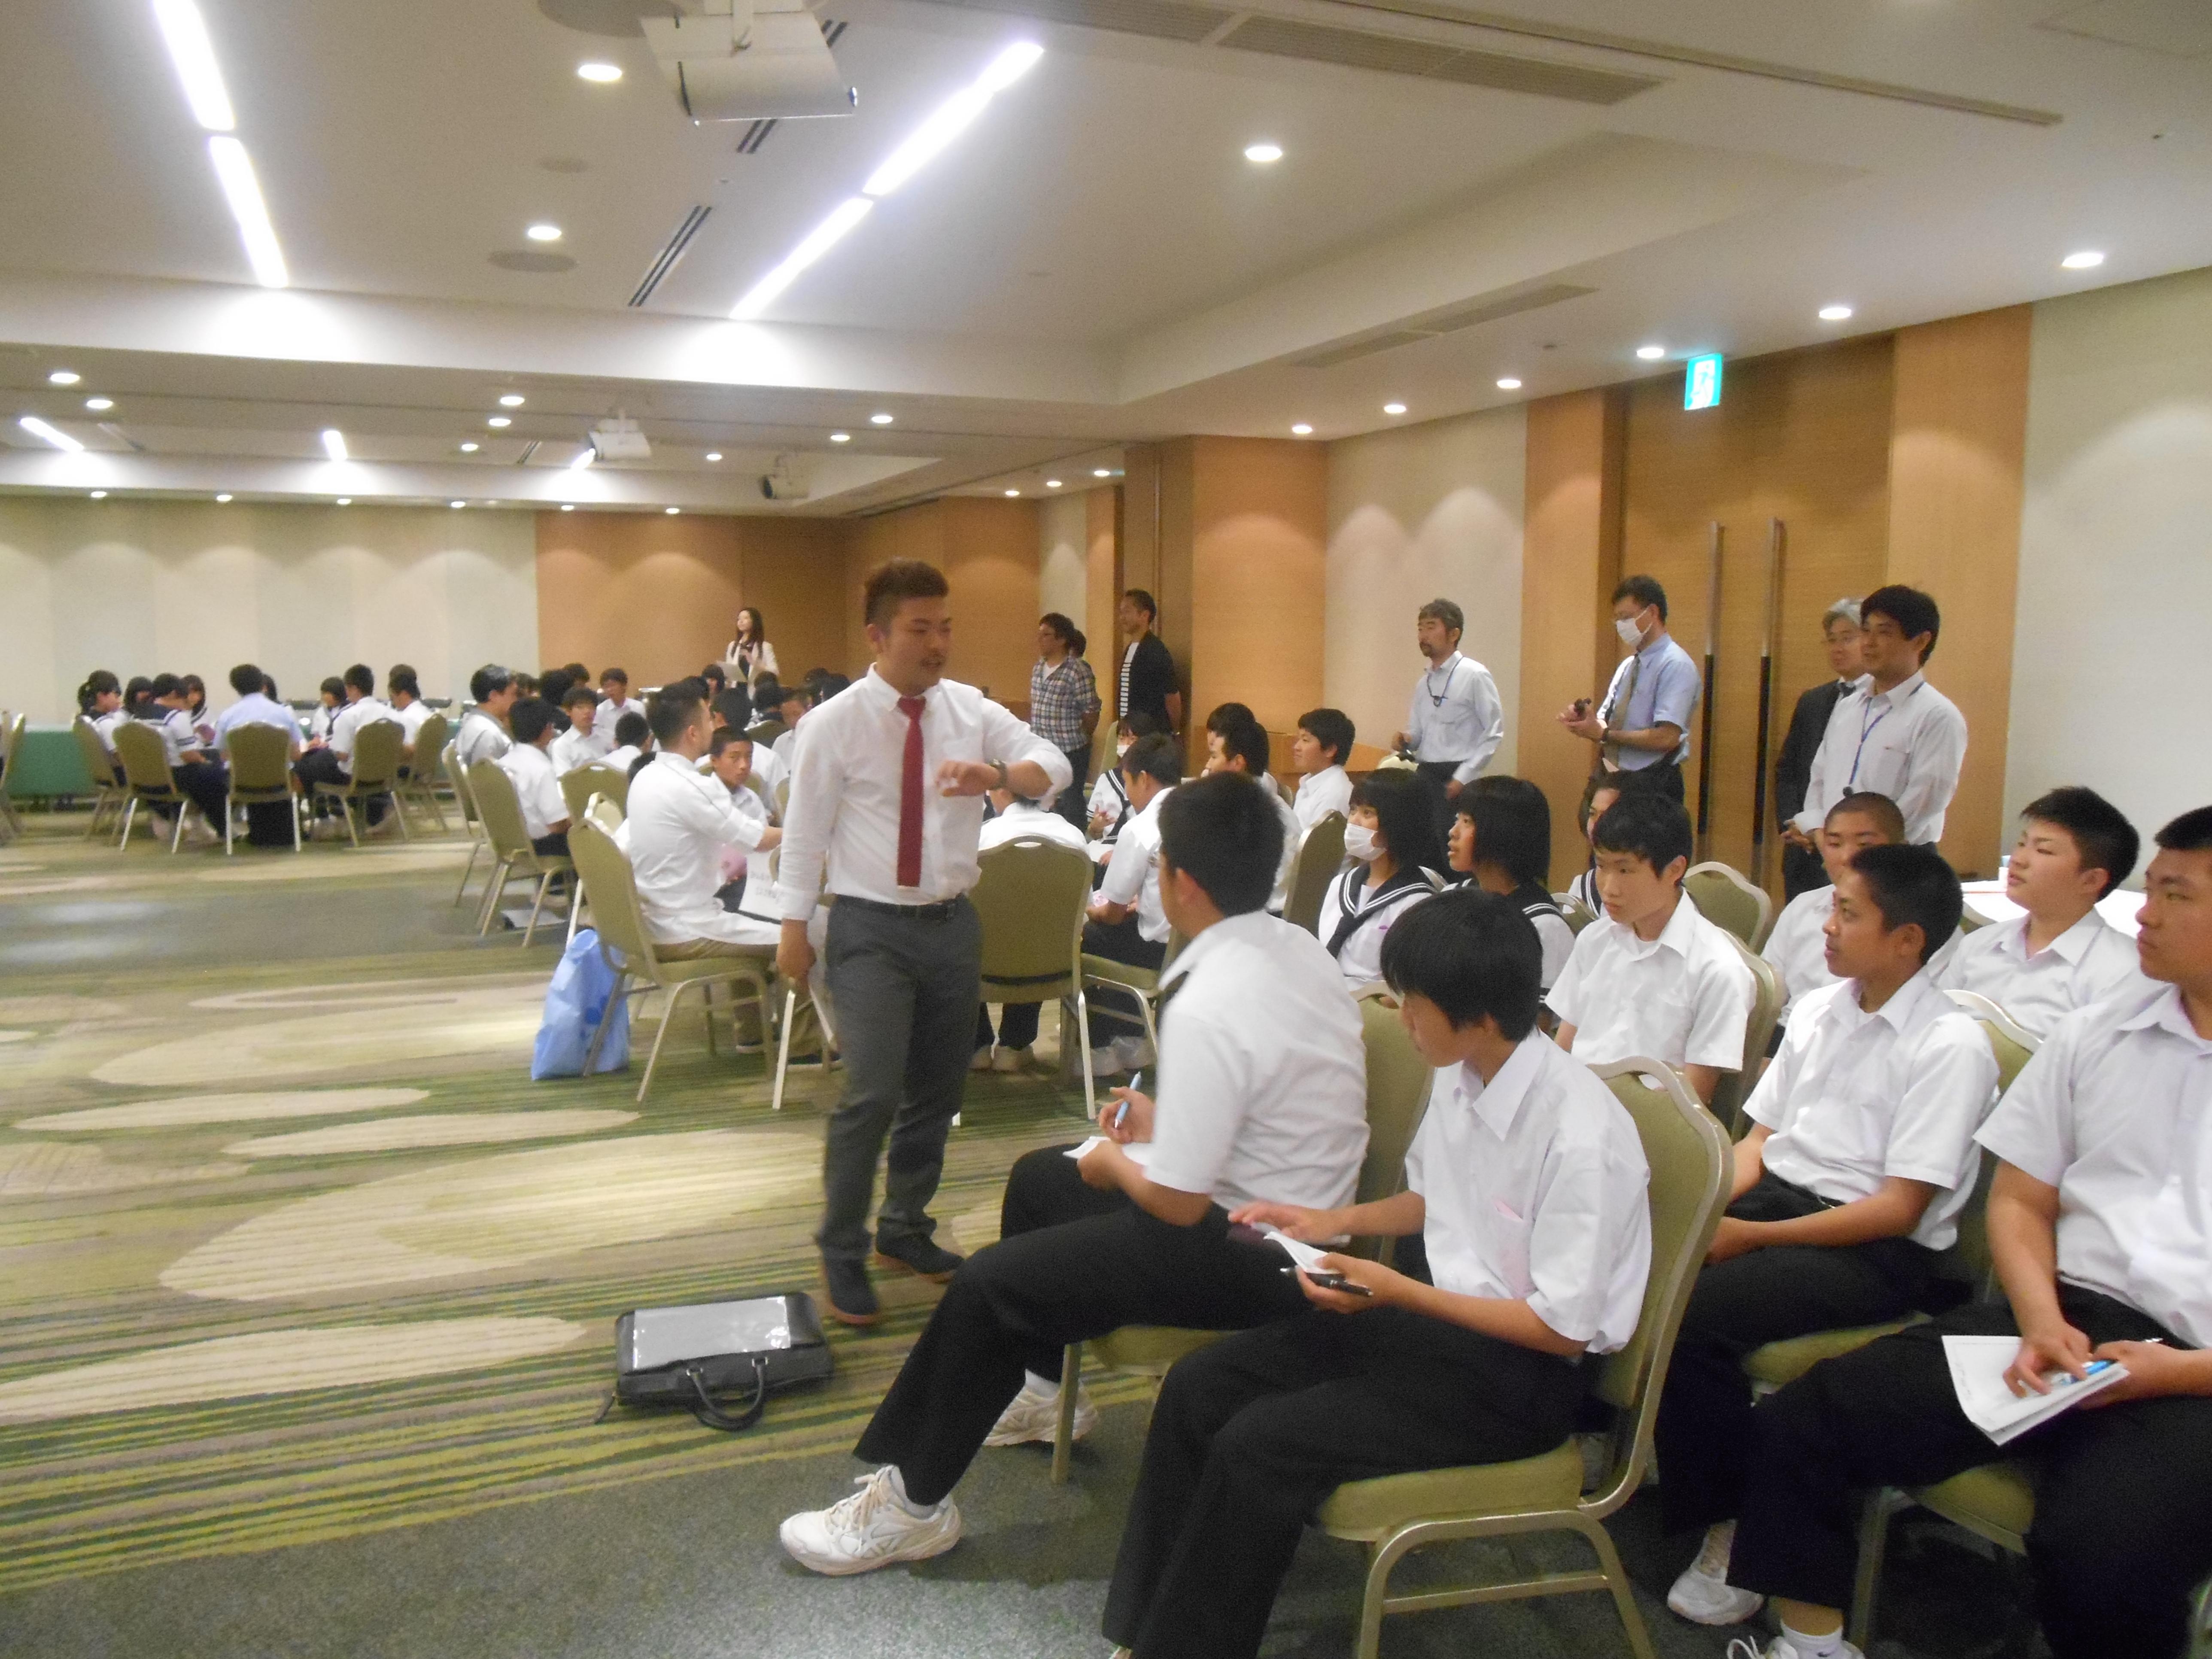 DSCN4386 - AOsuki主催:青森市内の中学校(修学旅行)に夢を与える時間